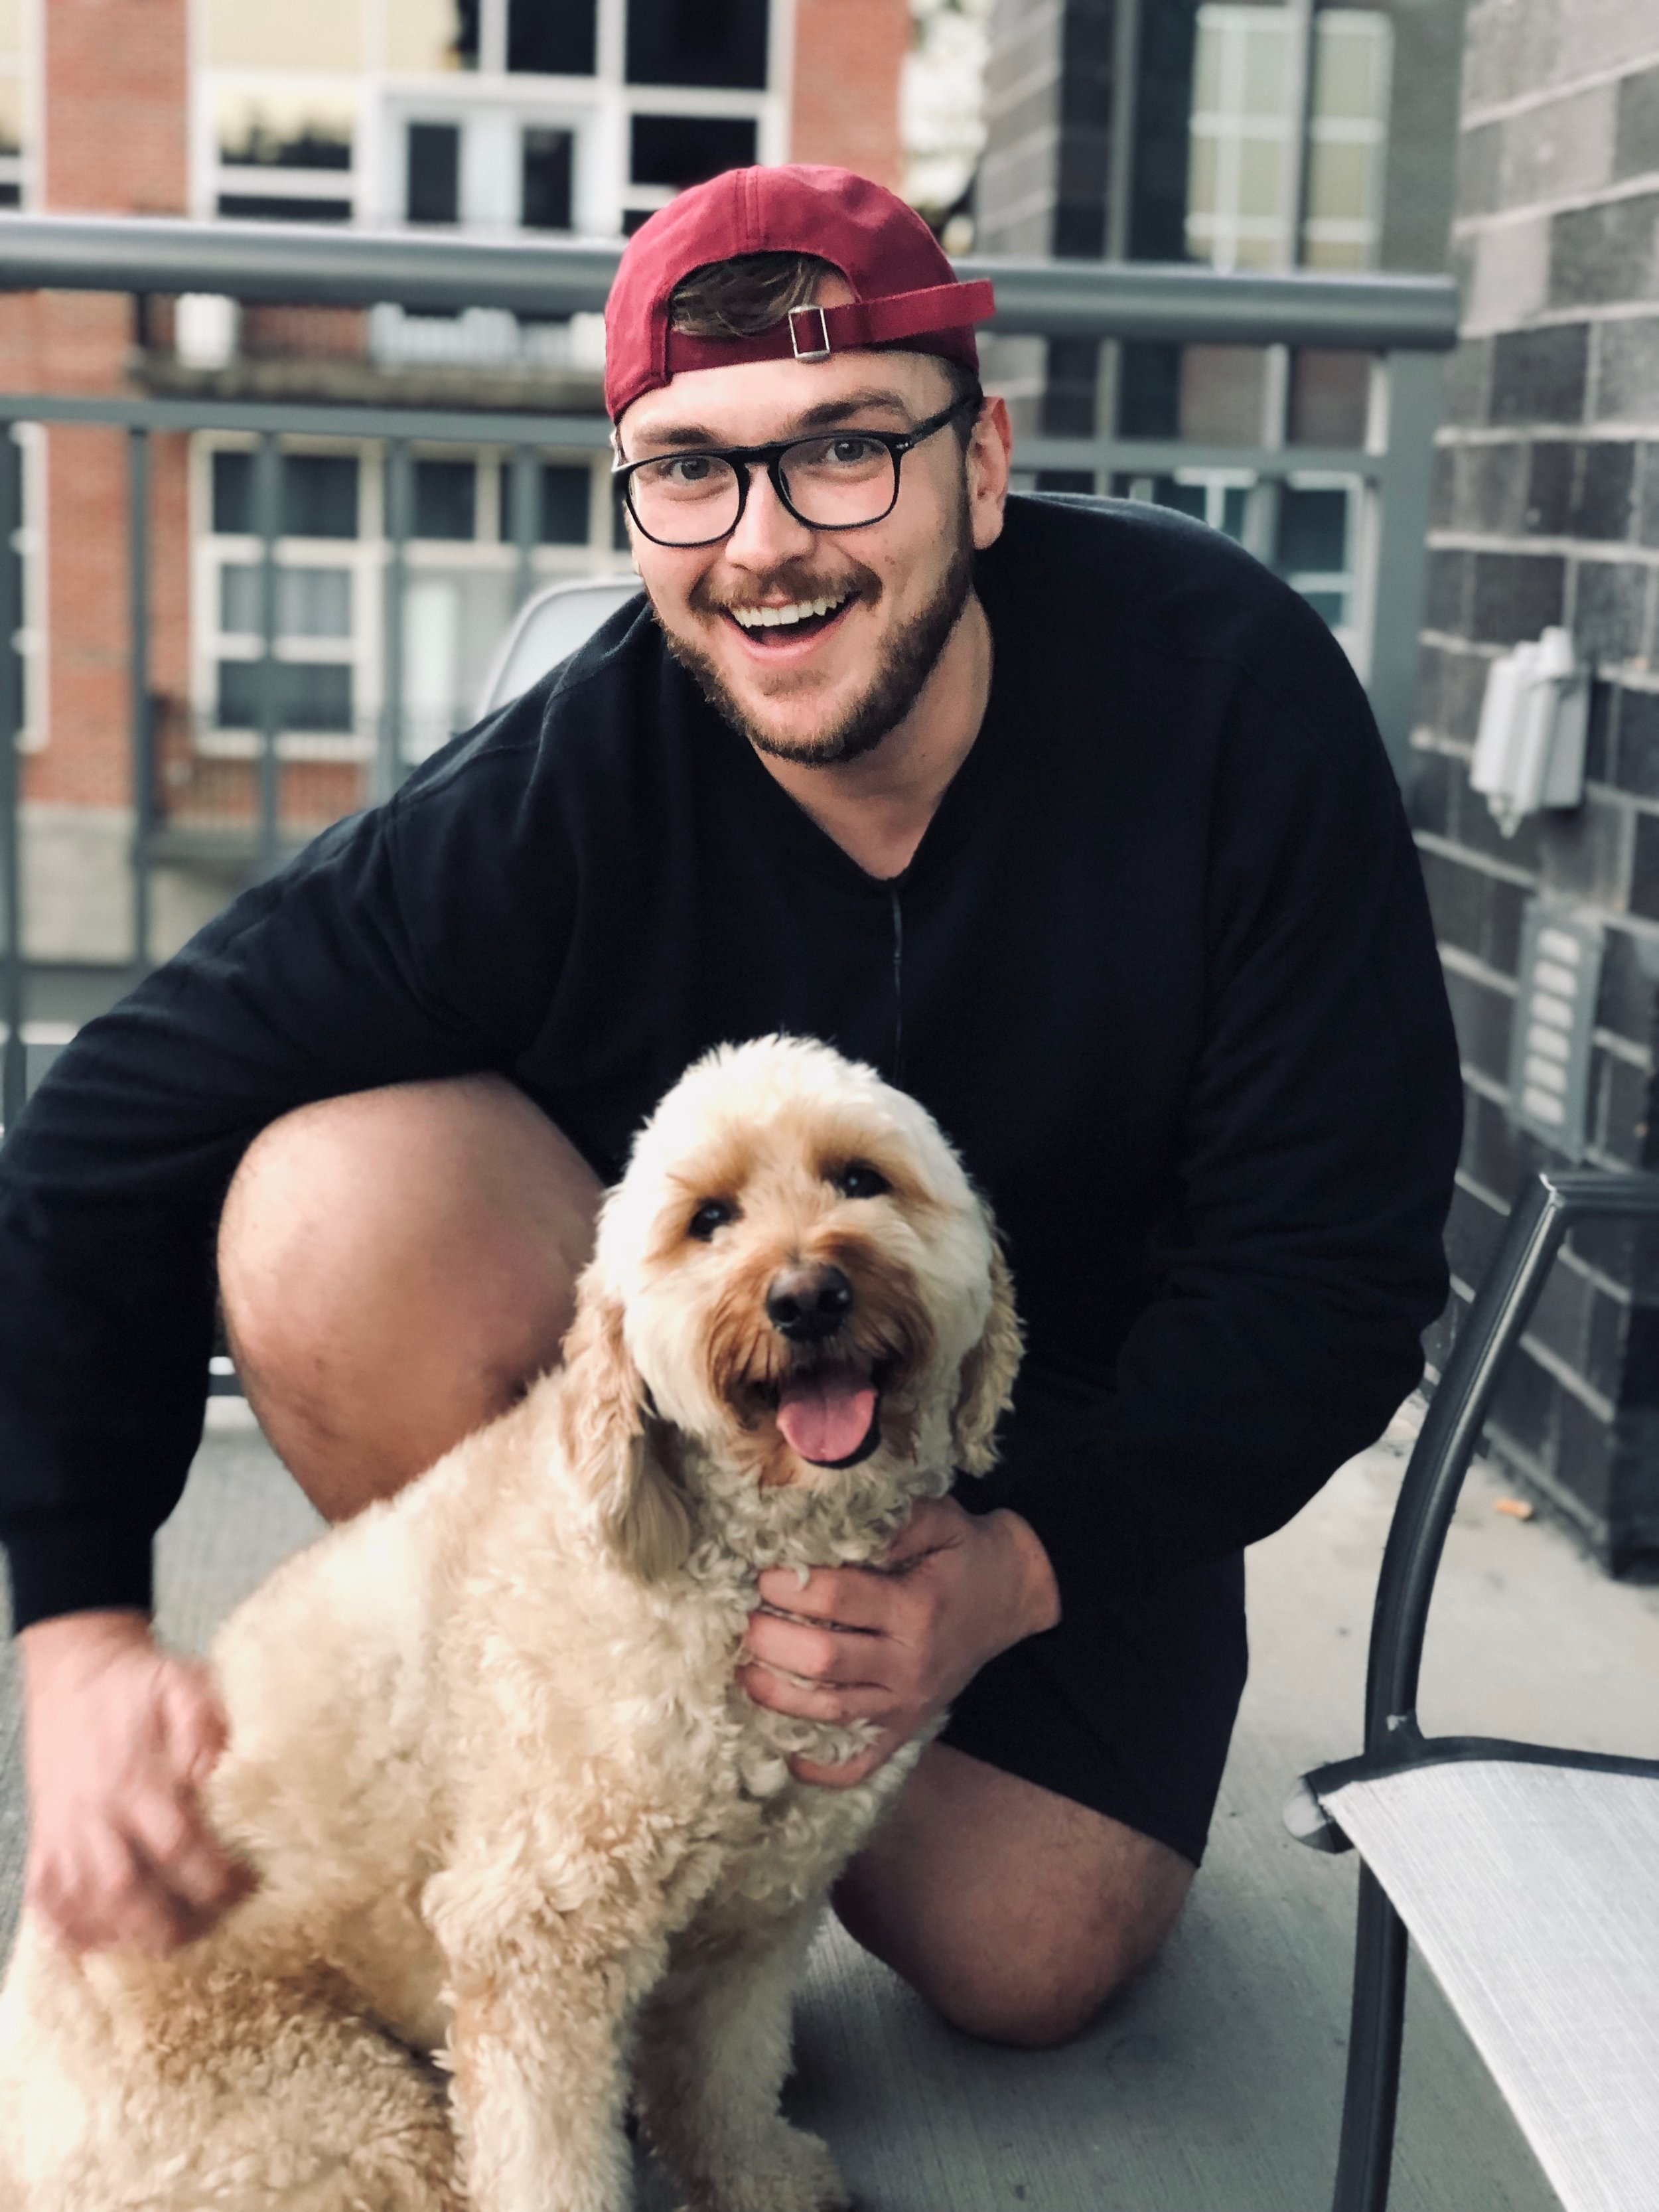 Daniel - Partner and Pack Leader